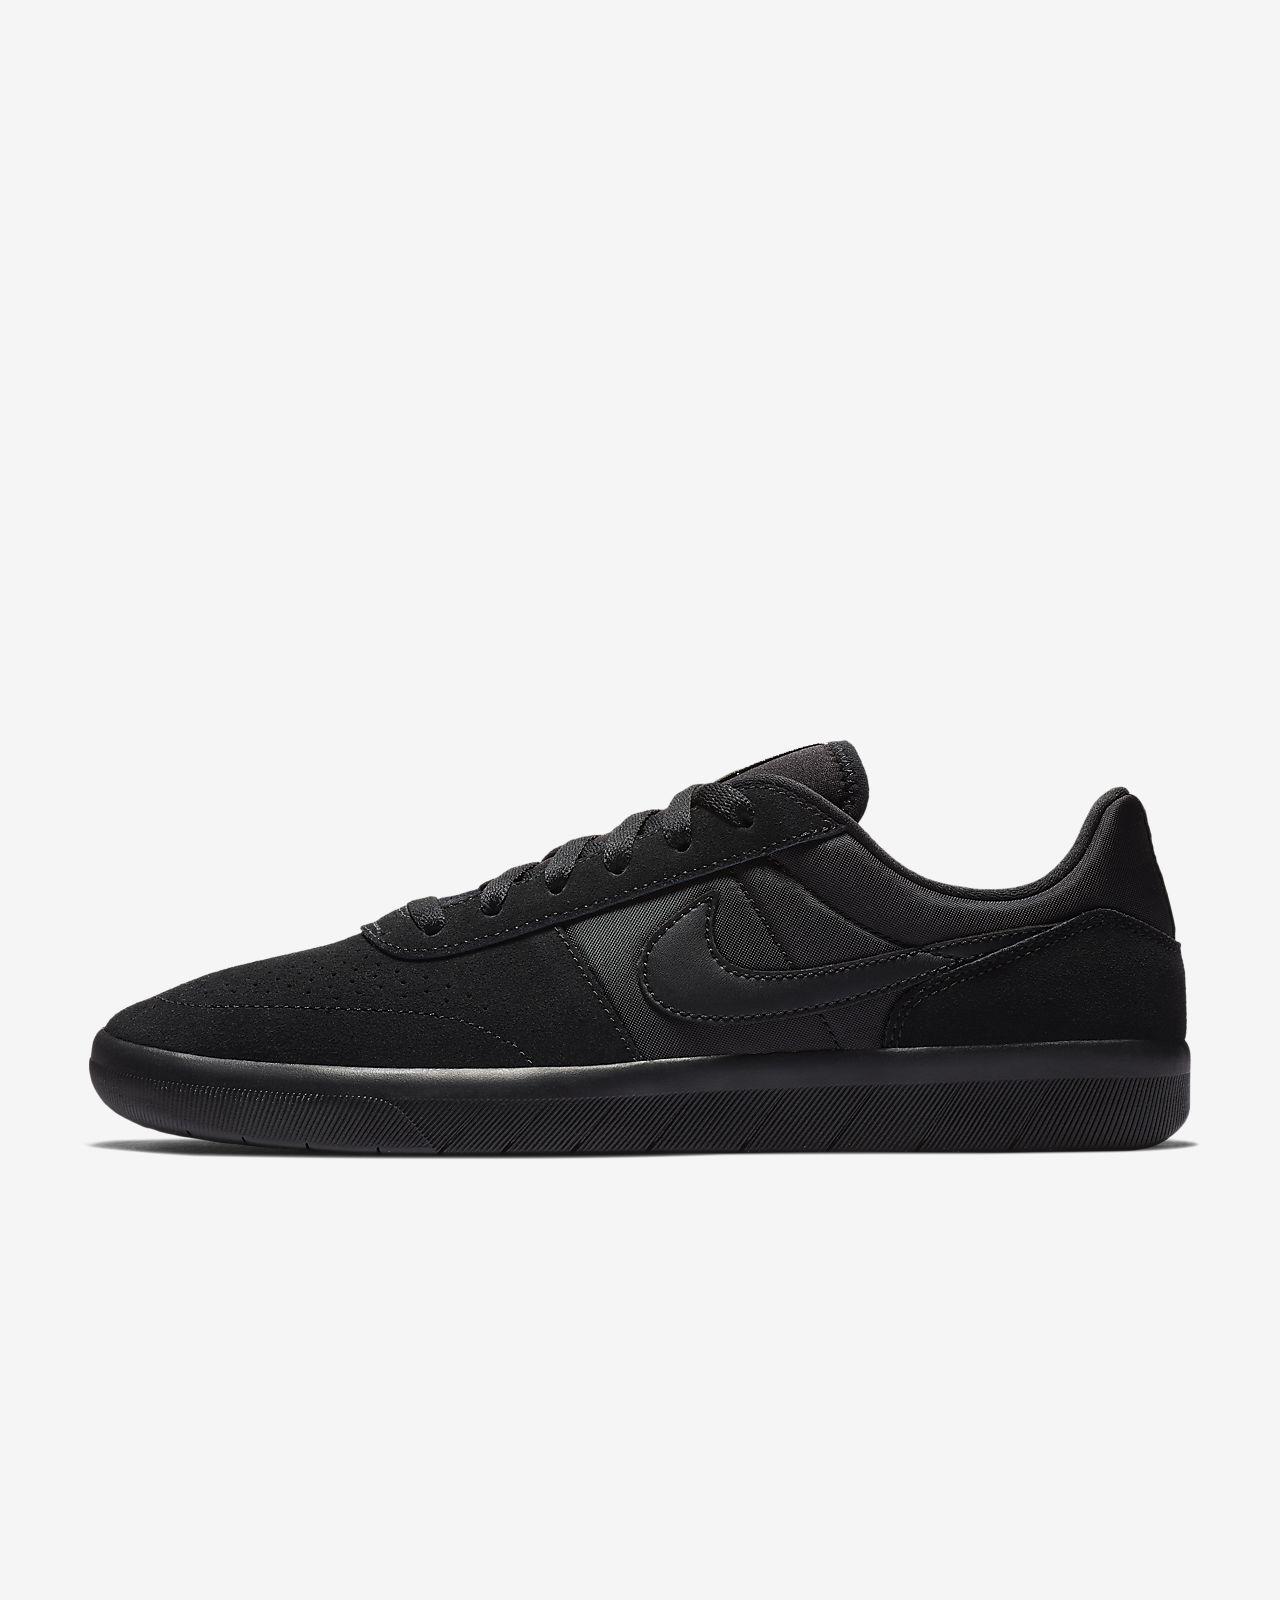 Nike SB Team Classic Skate Shoe